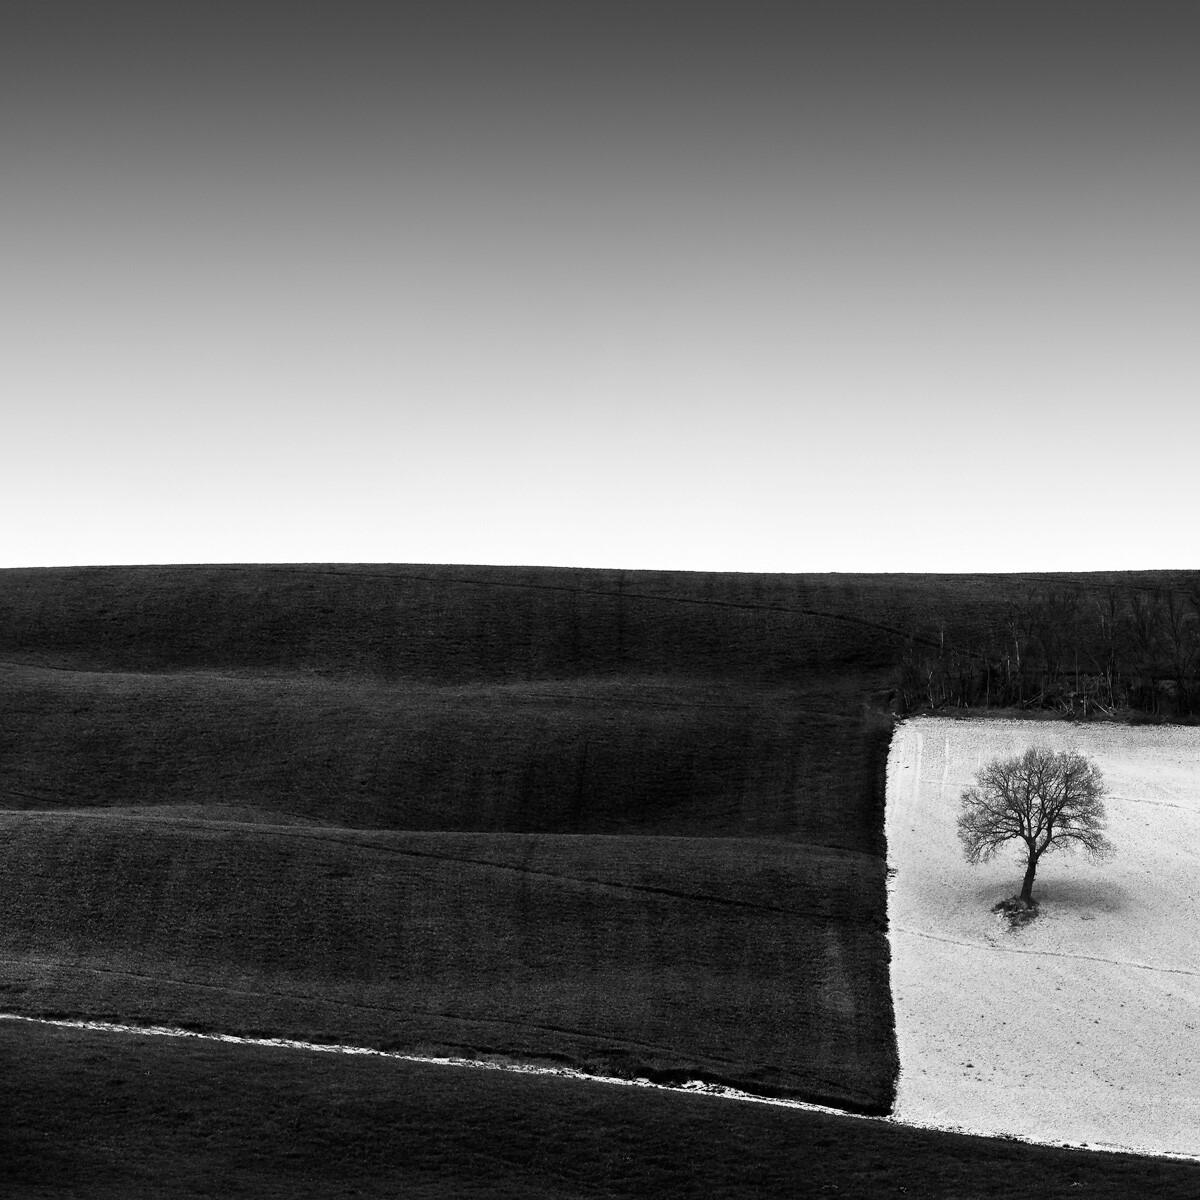 1 место в категории «Пейзаж», 2021. «Дерево в квадрате». Автор Розарио Чивелло